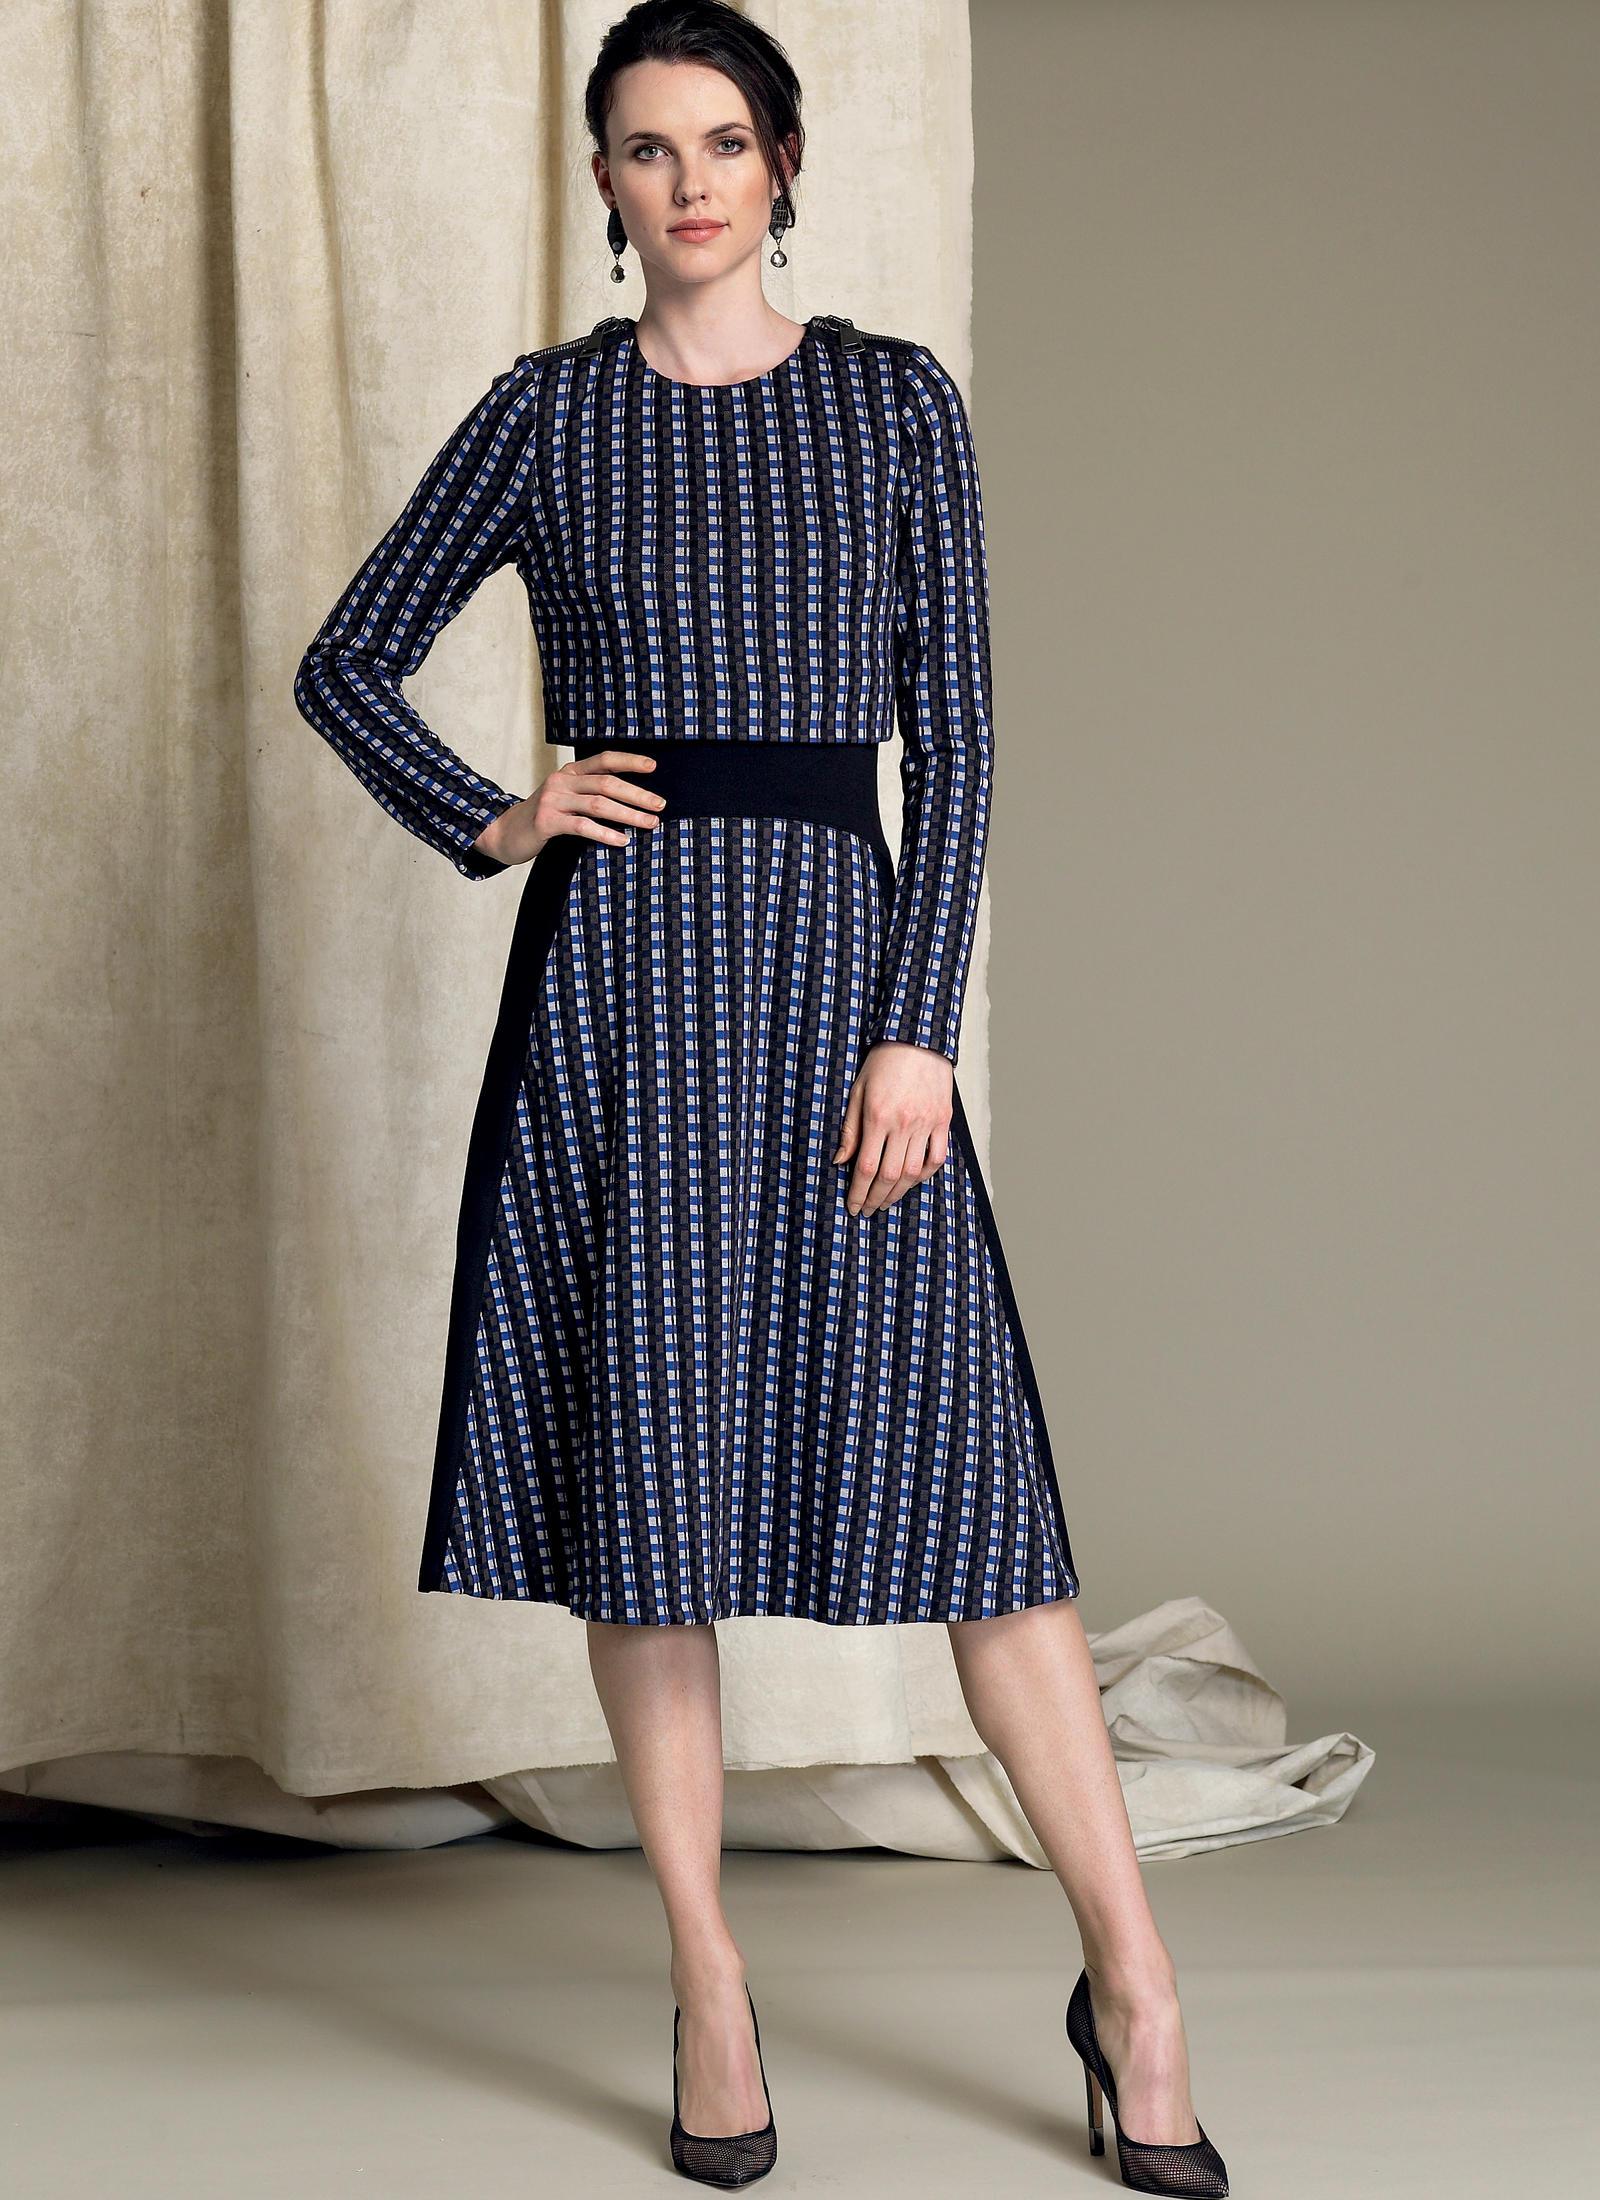 Dorable Midi Dress Sewing Pattern Sketch - Blanket Knitting Pattern ...